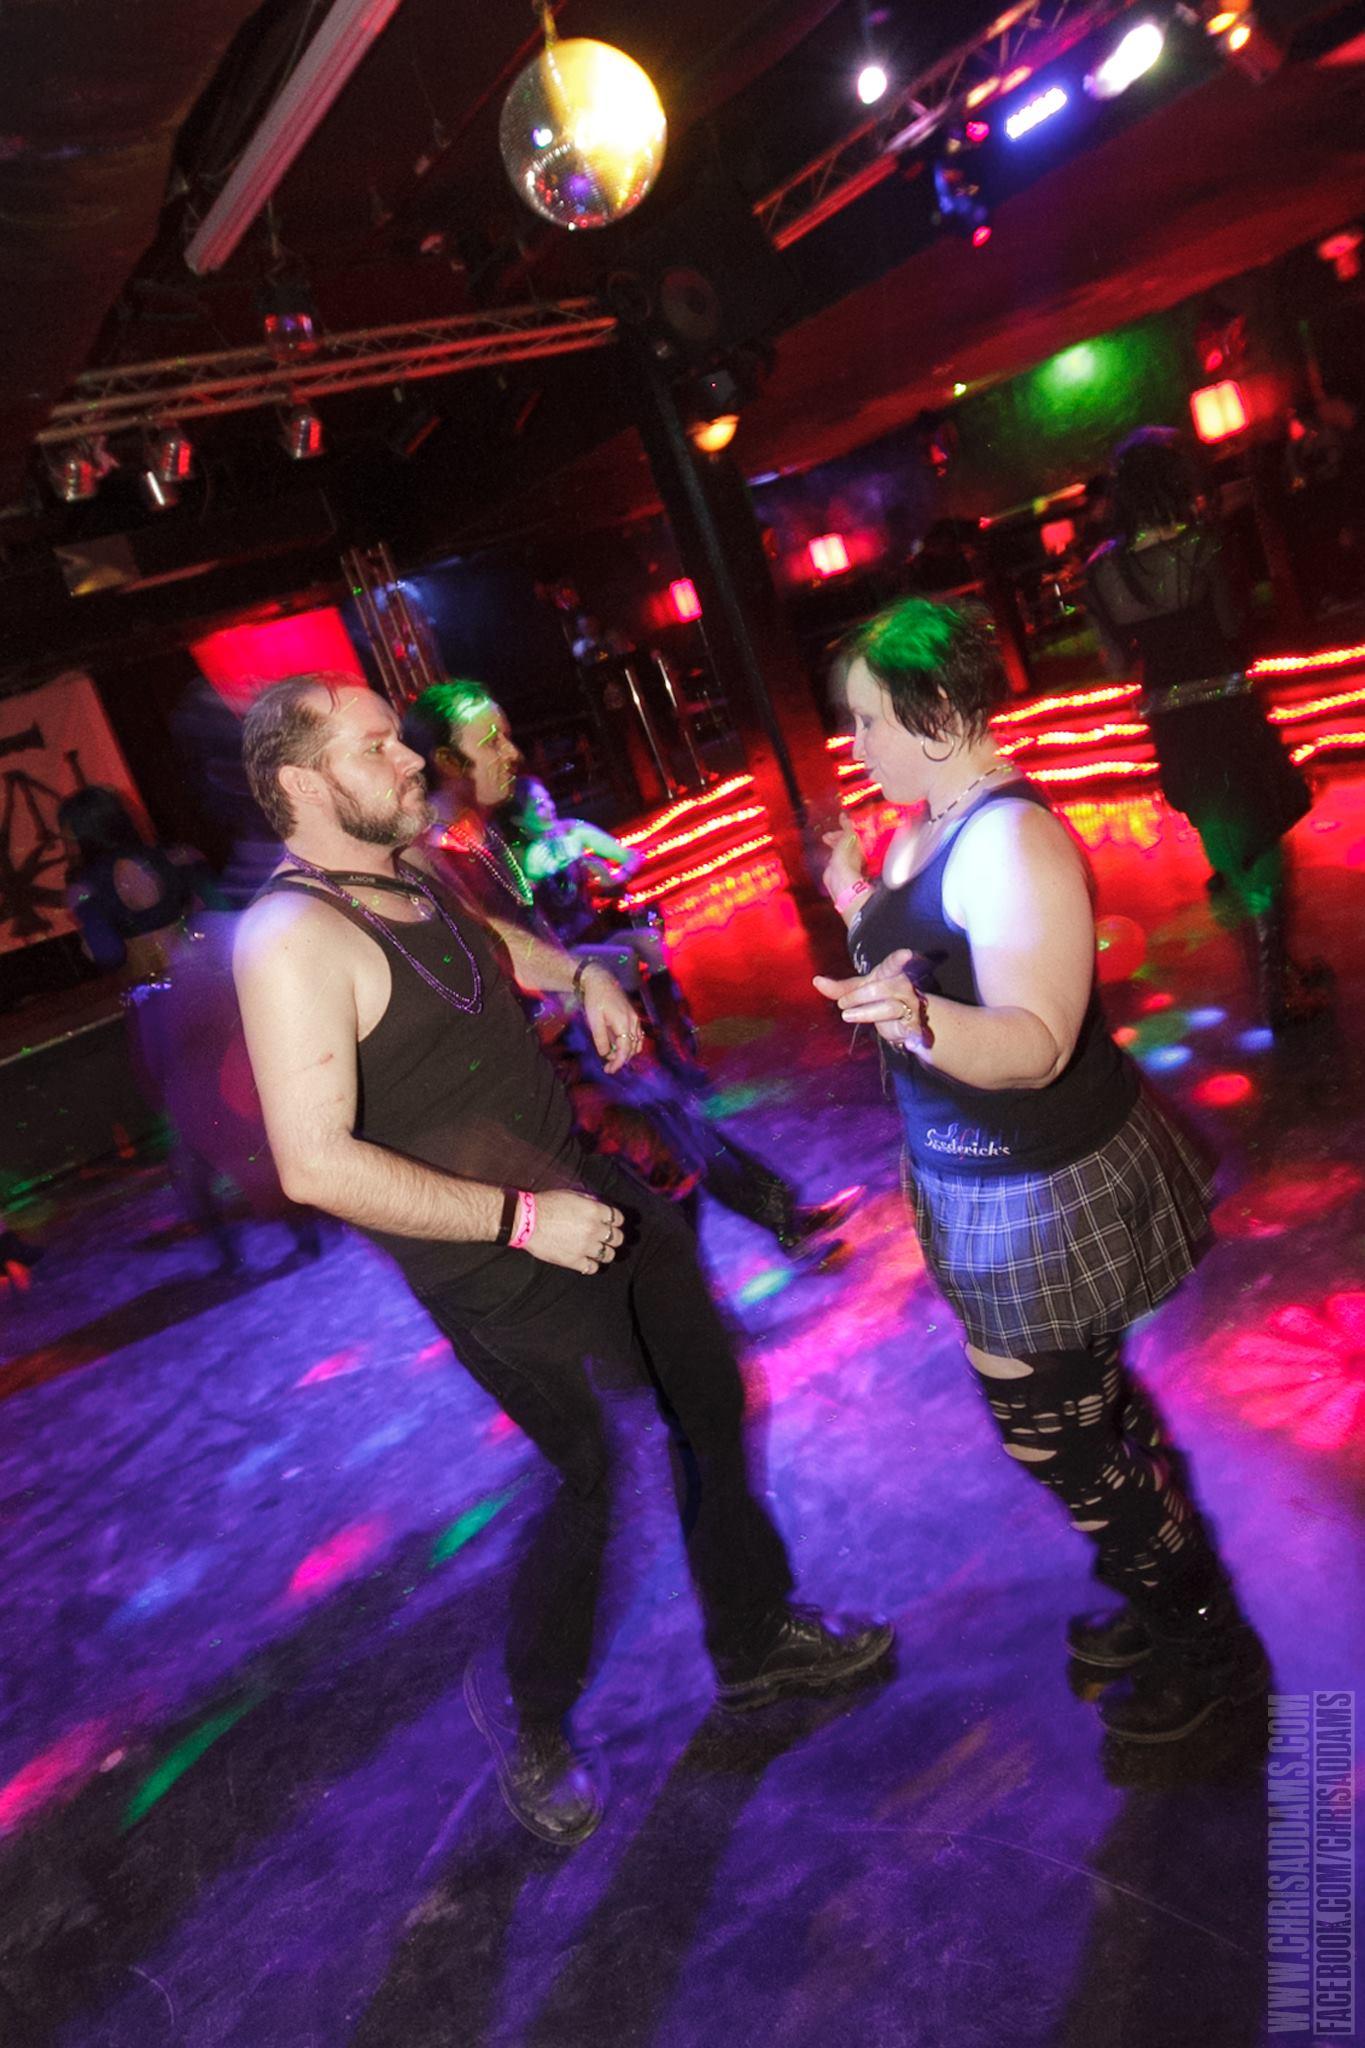 TheHavenClub-Goth-Industrial-Dance-Alternative-Northampton-MA (1).jpg